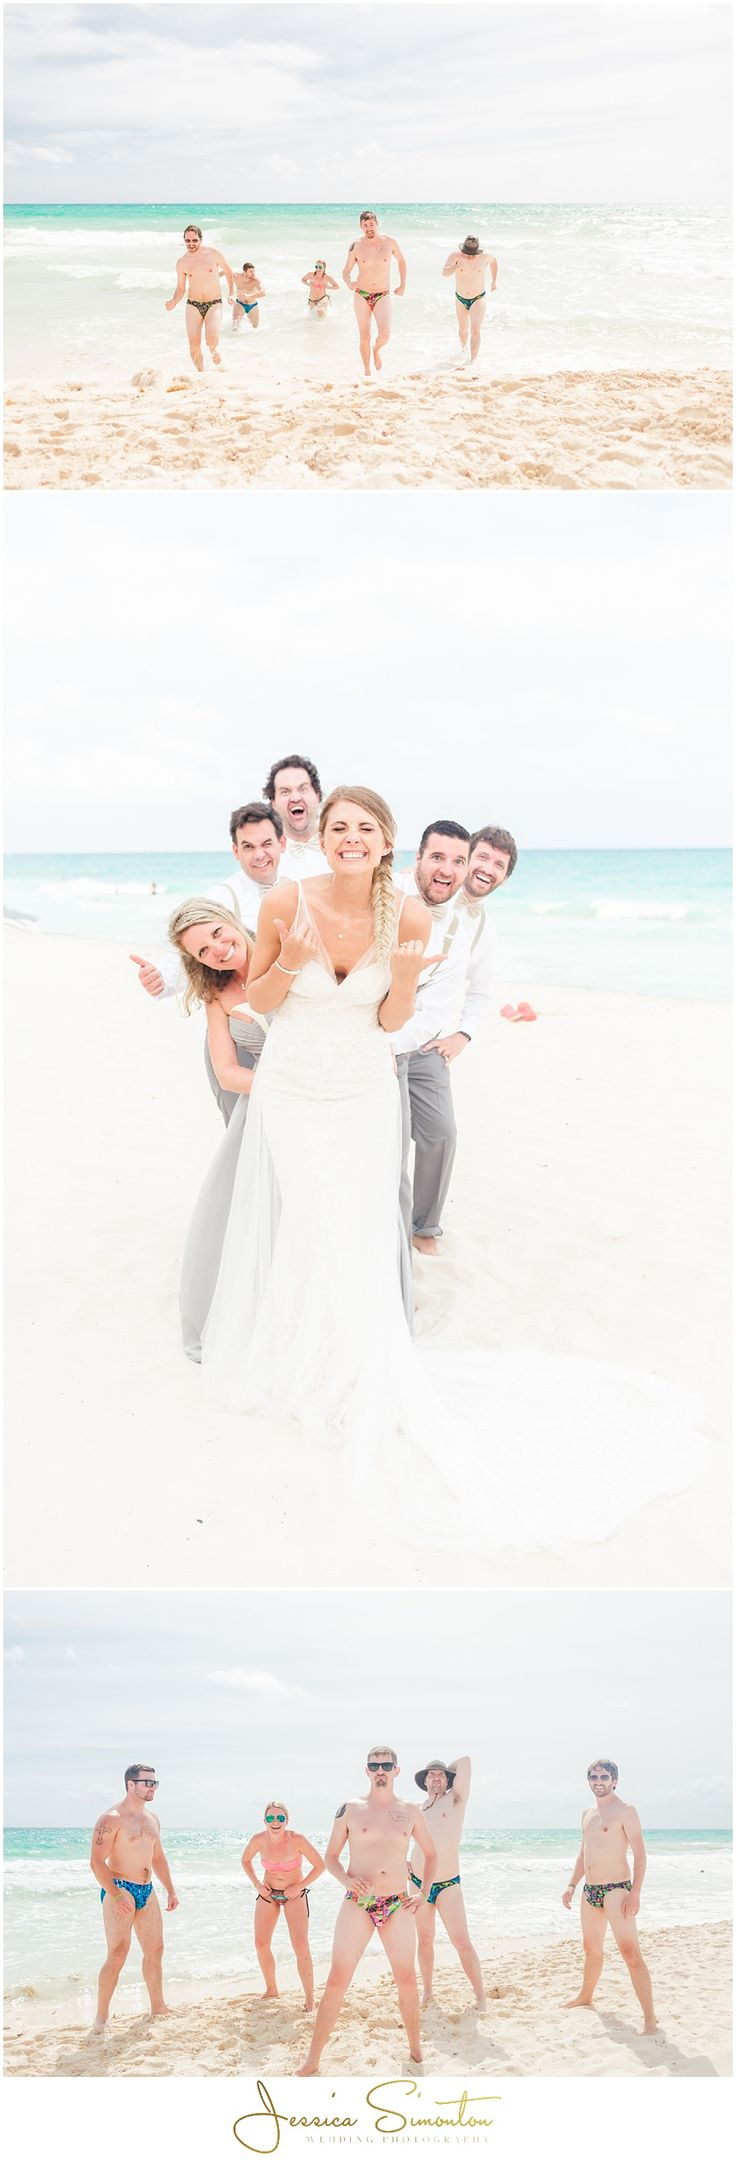 groom and groomsmen in speedos on beach